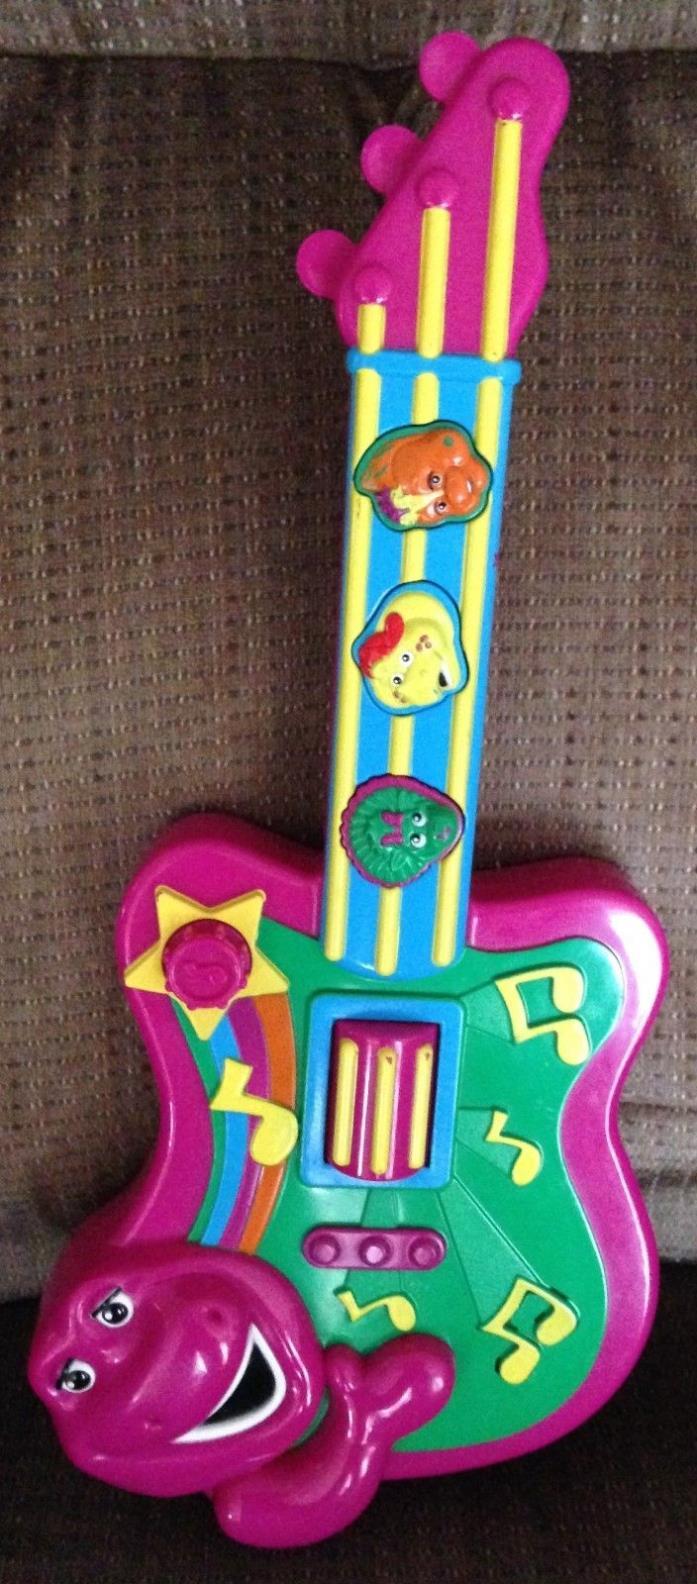 2007 Jakks Pacific Barney Dinosaur Musical Talking Guitar Riff BJ Baby Bop Toy